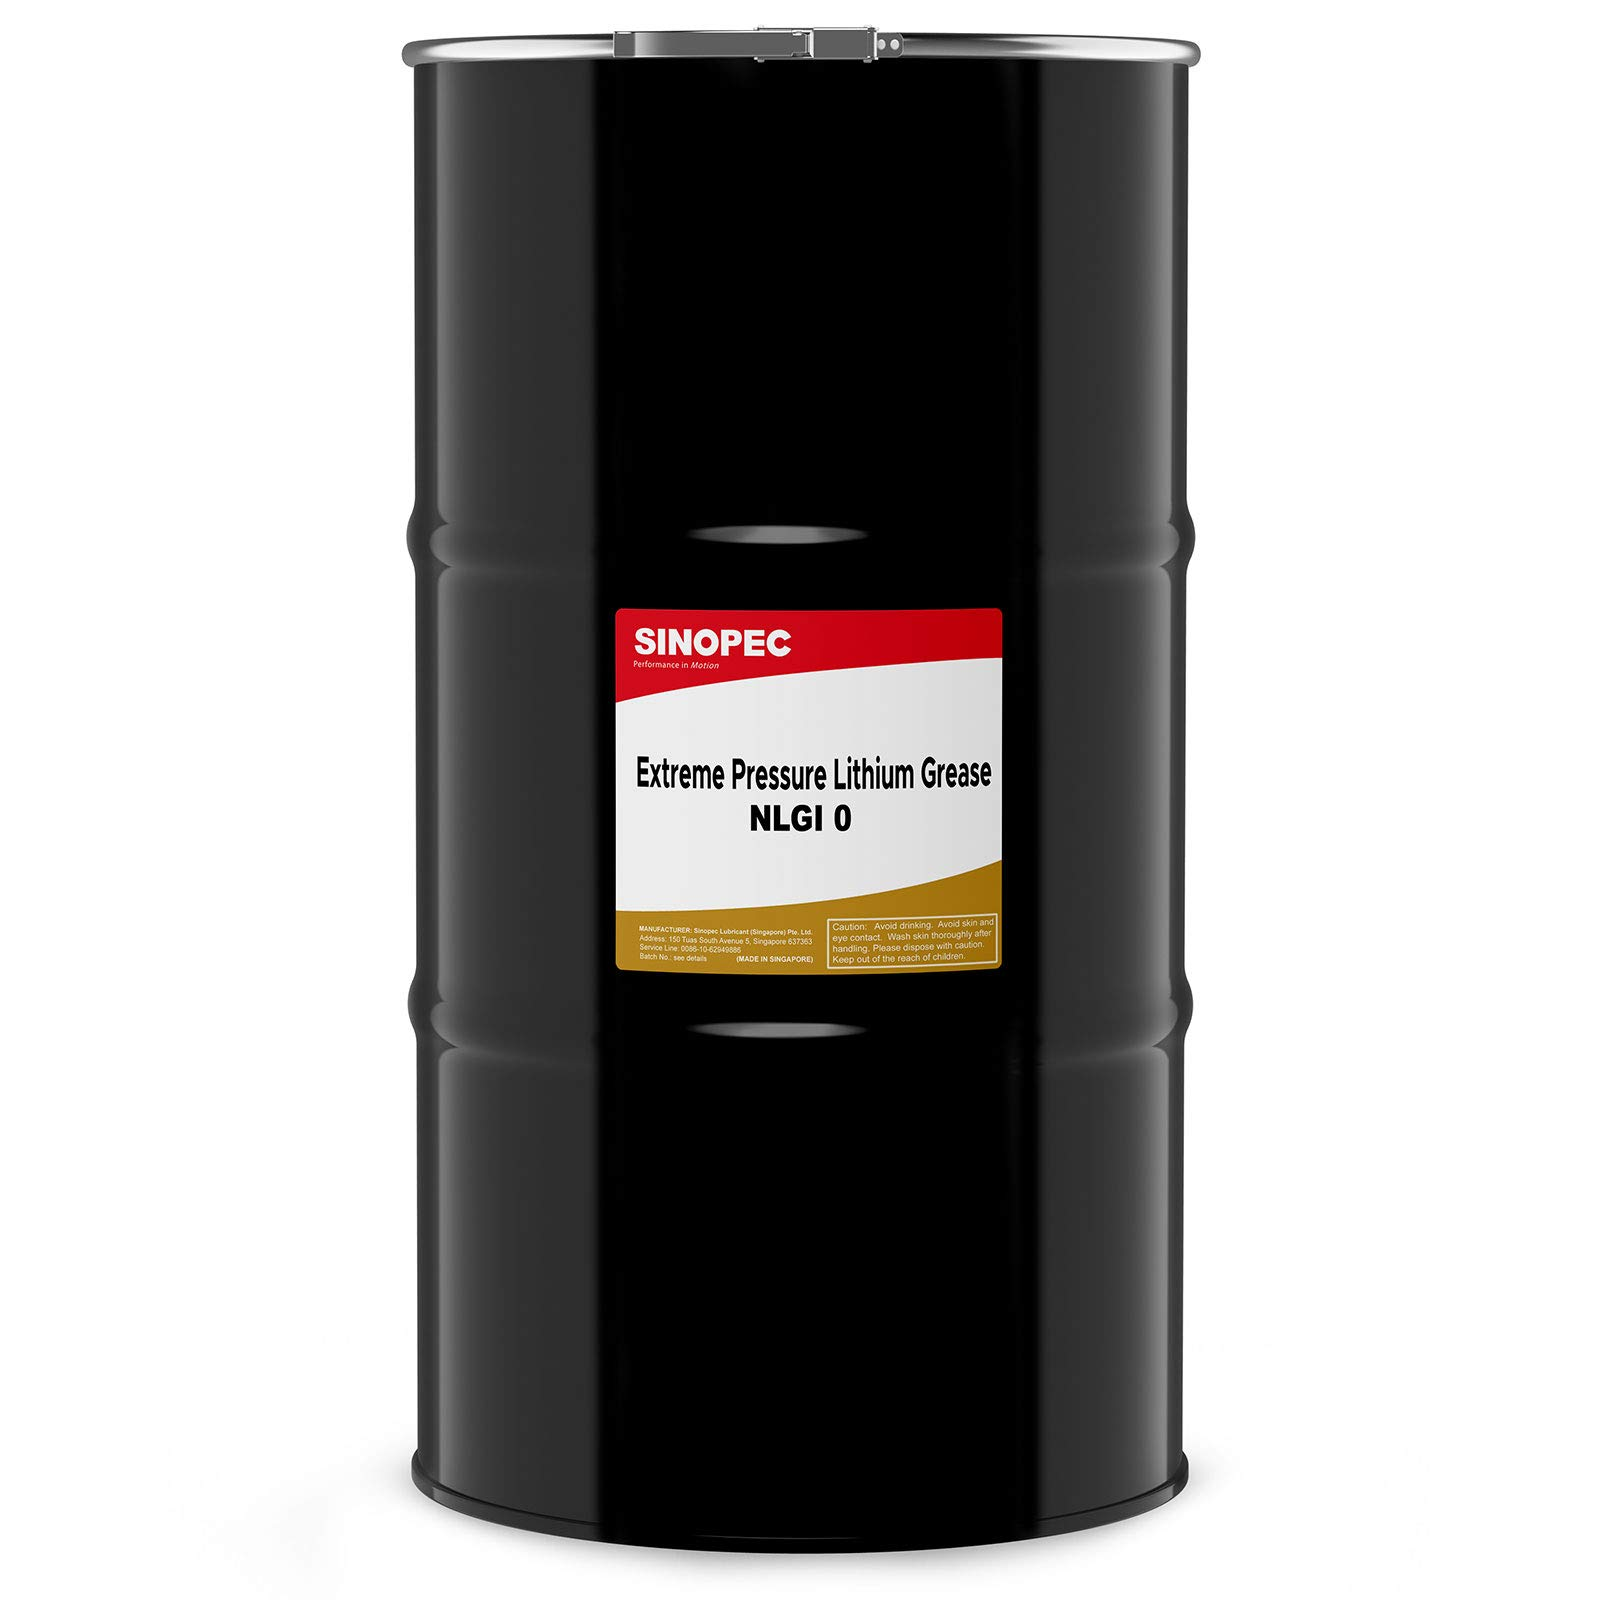 Sinopec (EP0) Extreme Pressure Multipurpose Lithium Grease, NLGI 0-120LB. (16 Gallon) Keg